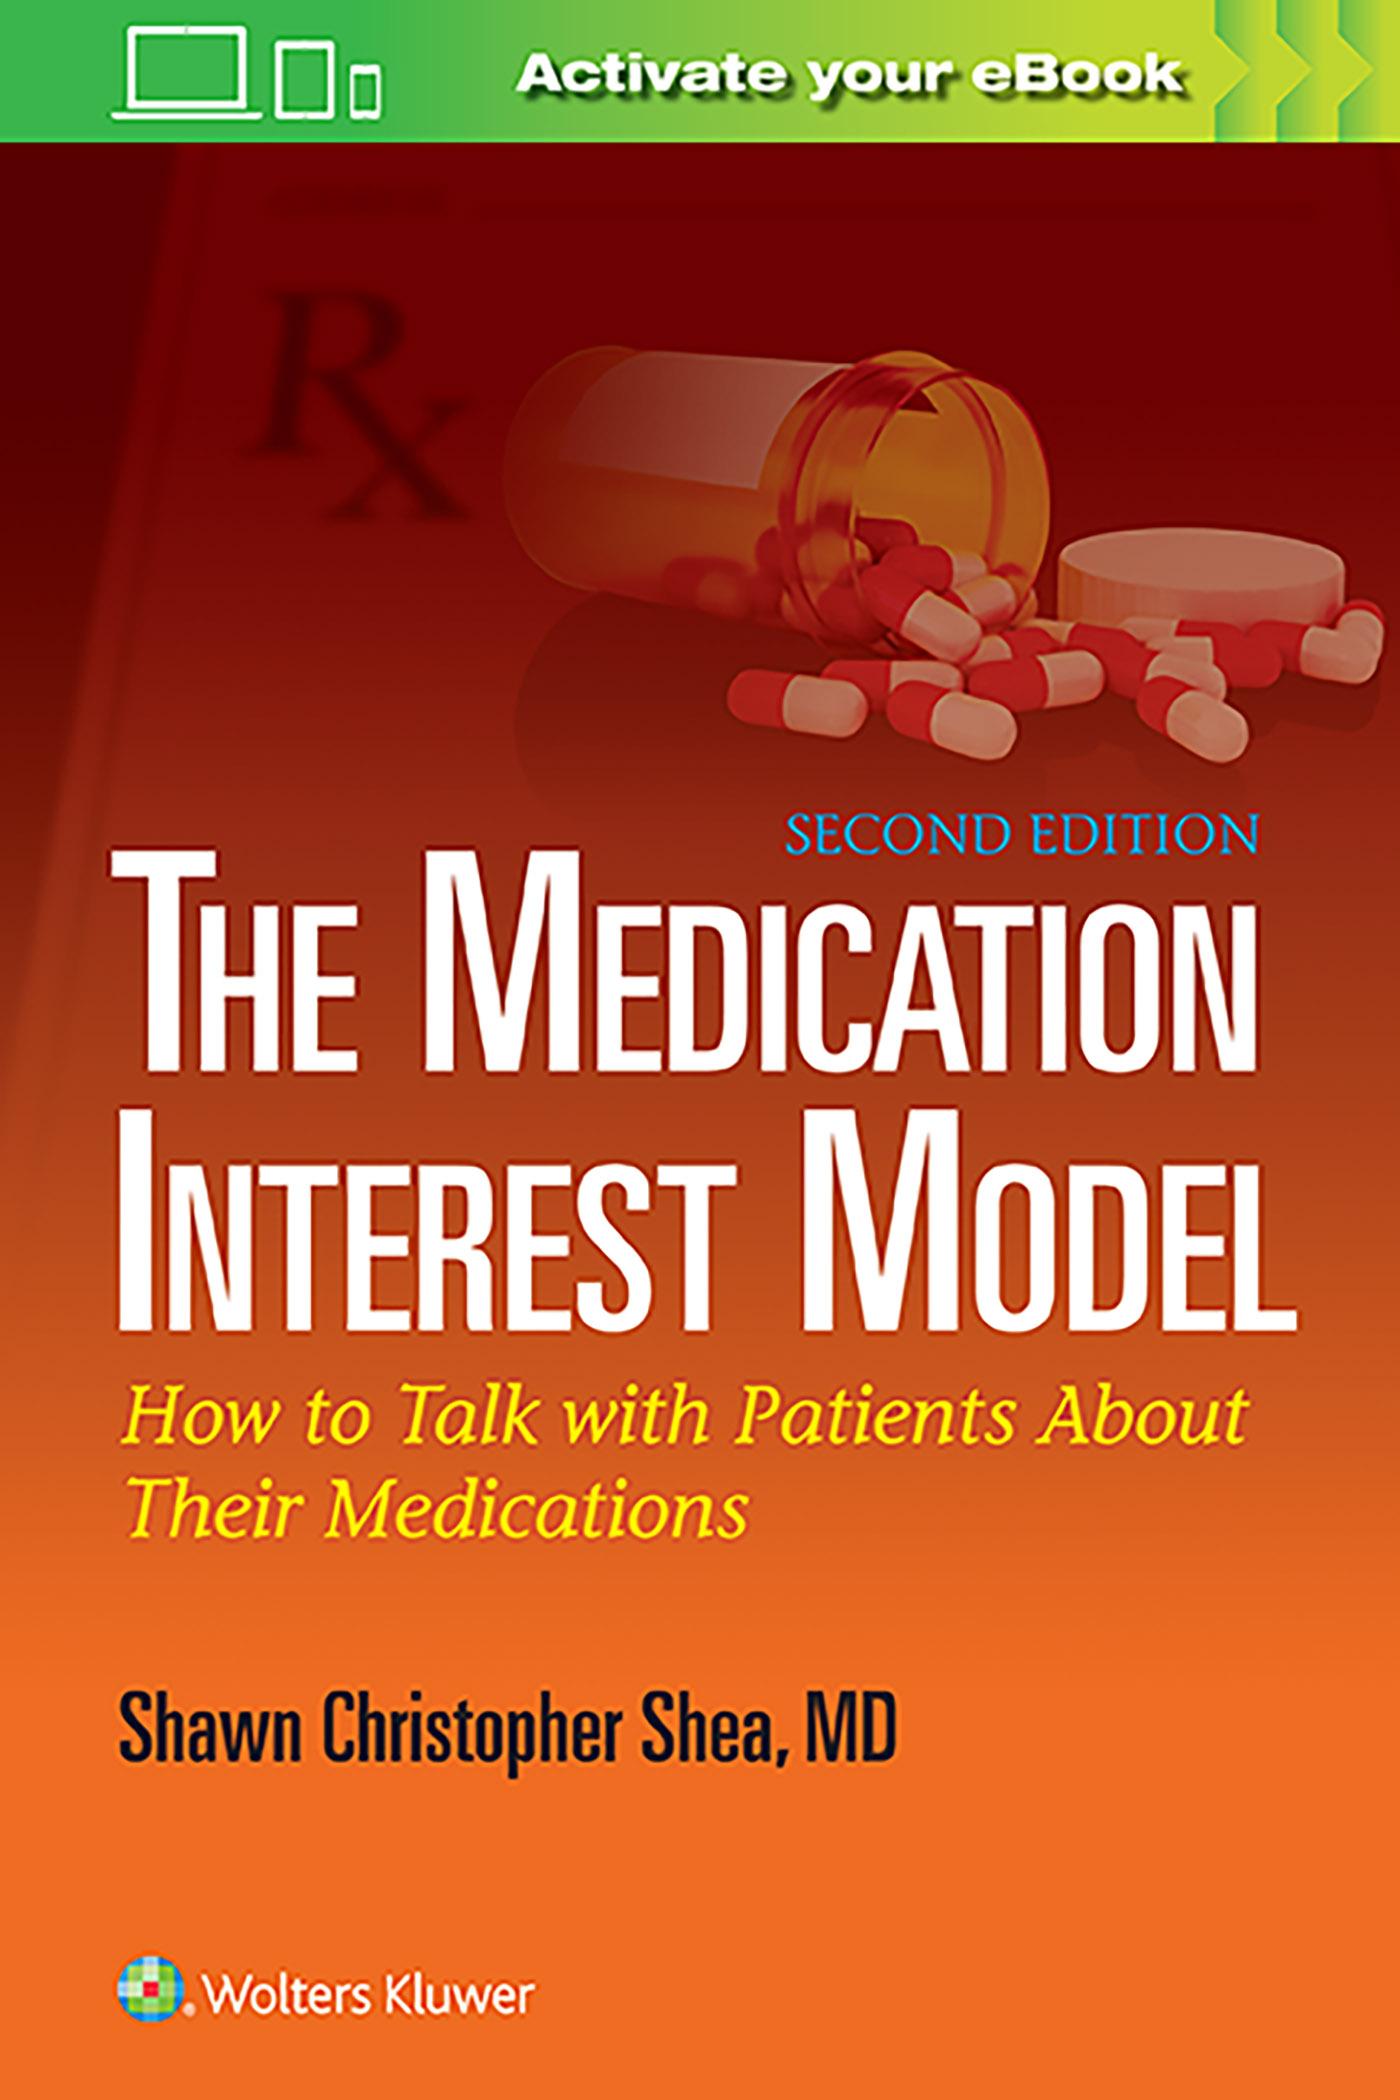 Harvard nursing guide to drugs ebook ebook array the medication interest model rh shop lww com fandeluxe Image collections